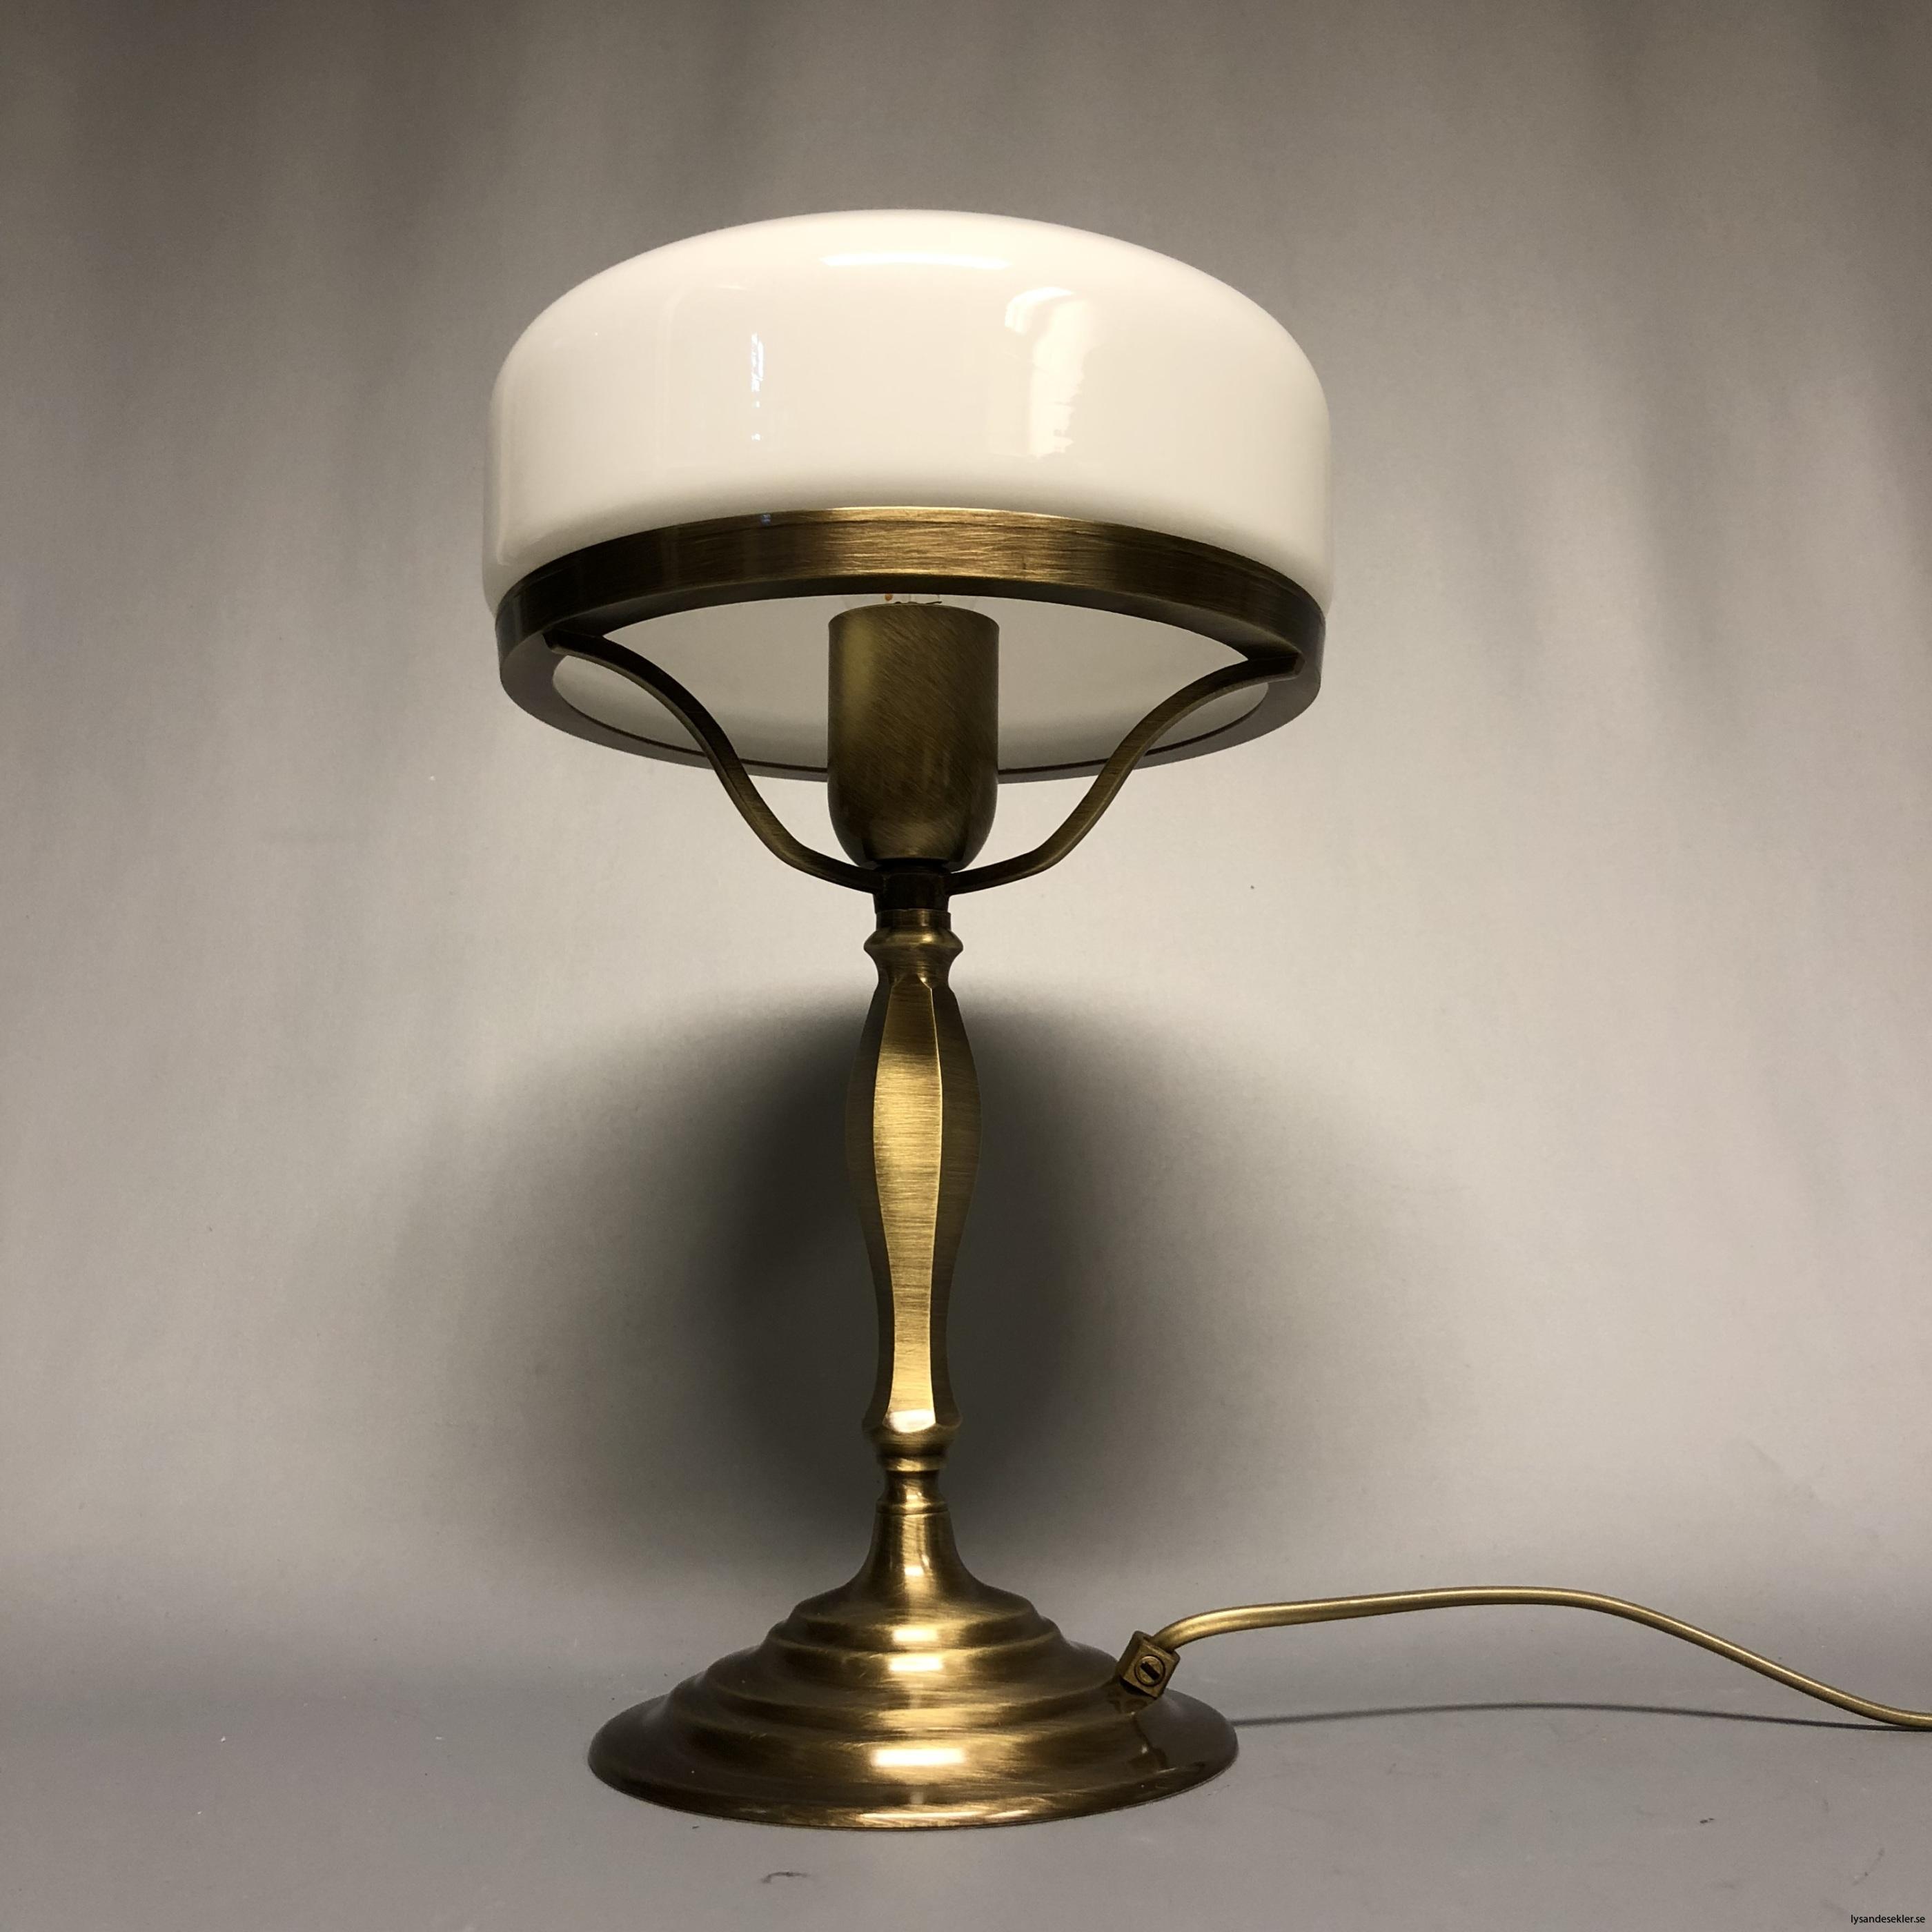 strindbergslampa strindbergslampor strindberg lampa skärm kupa strindbergsskärm strindbergskupa3